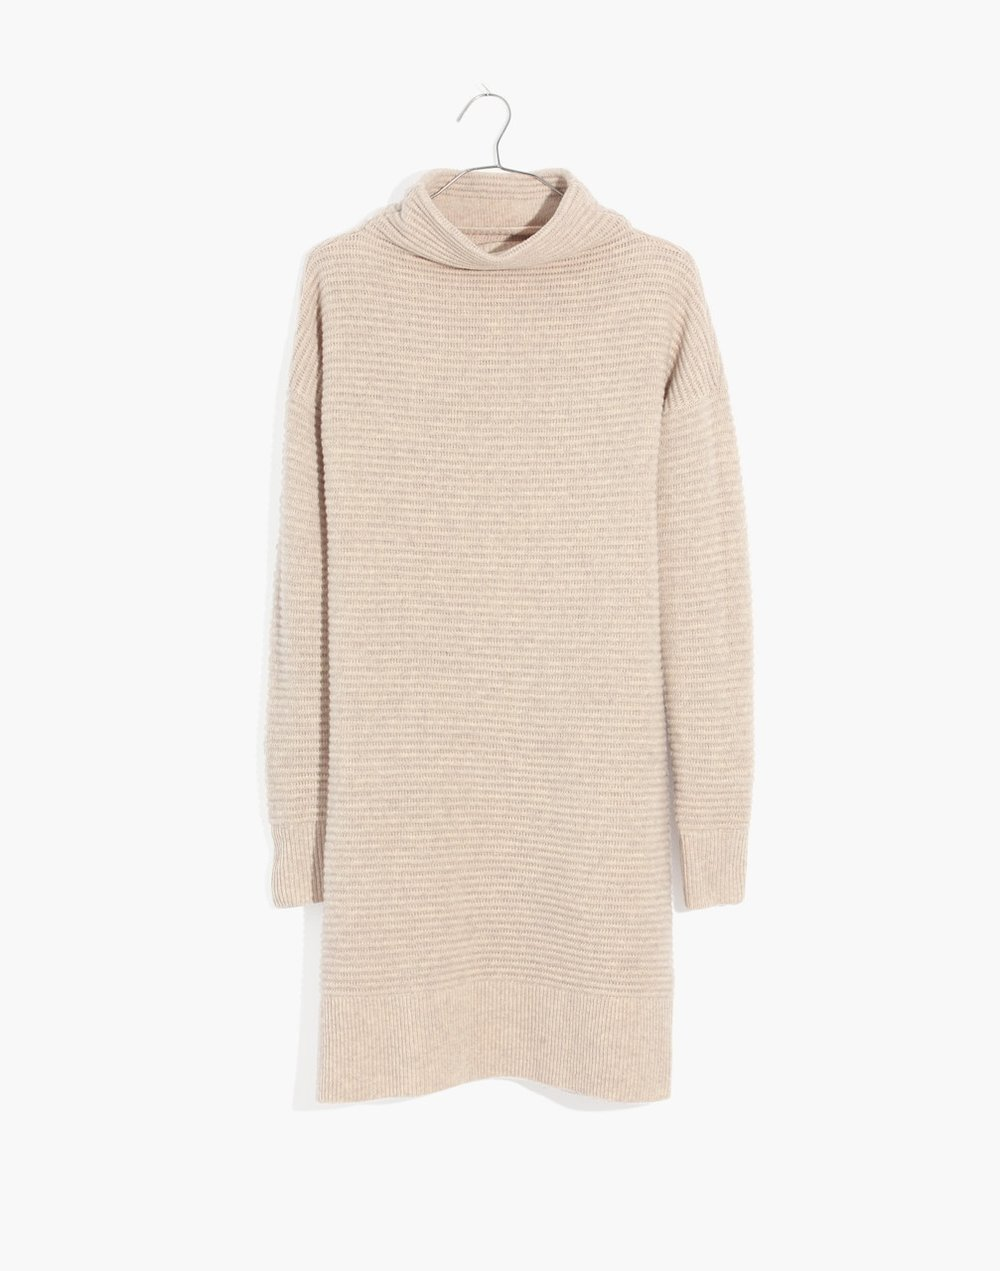 Skyscraper Sweater Dress - Madewell